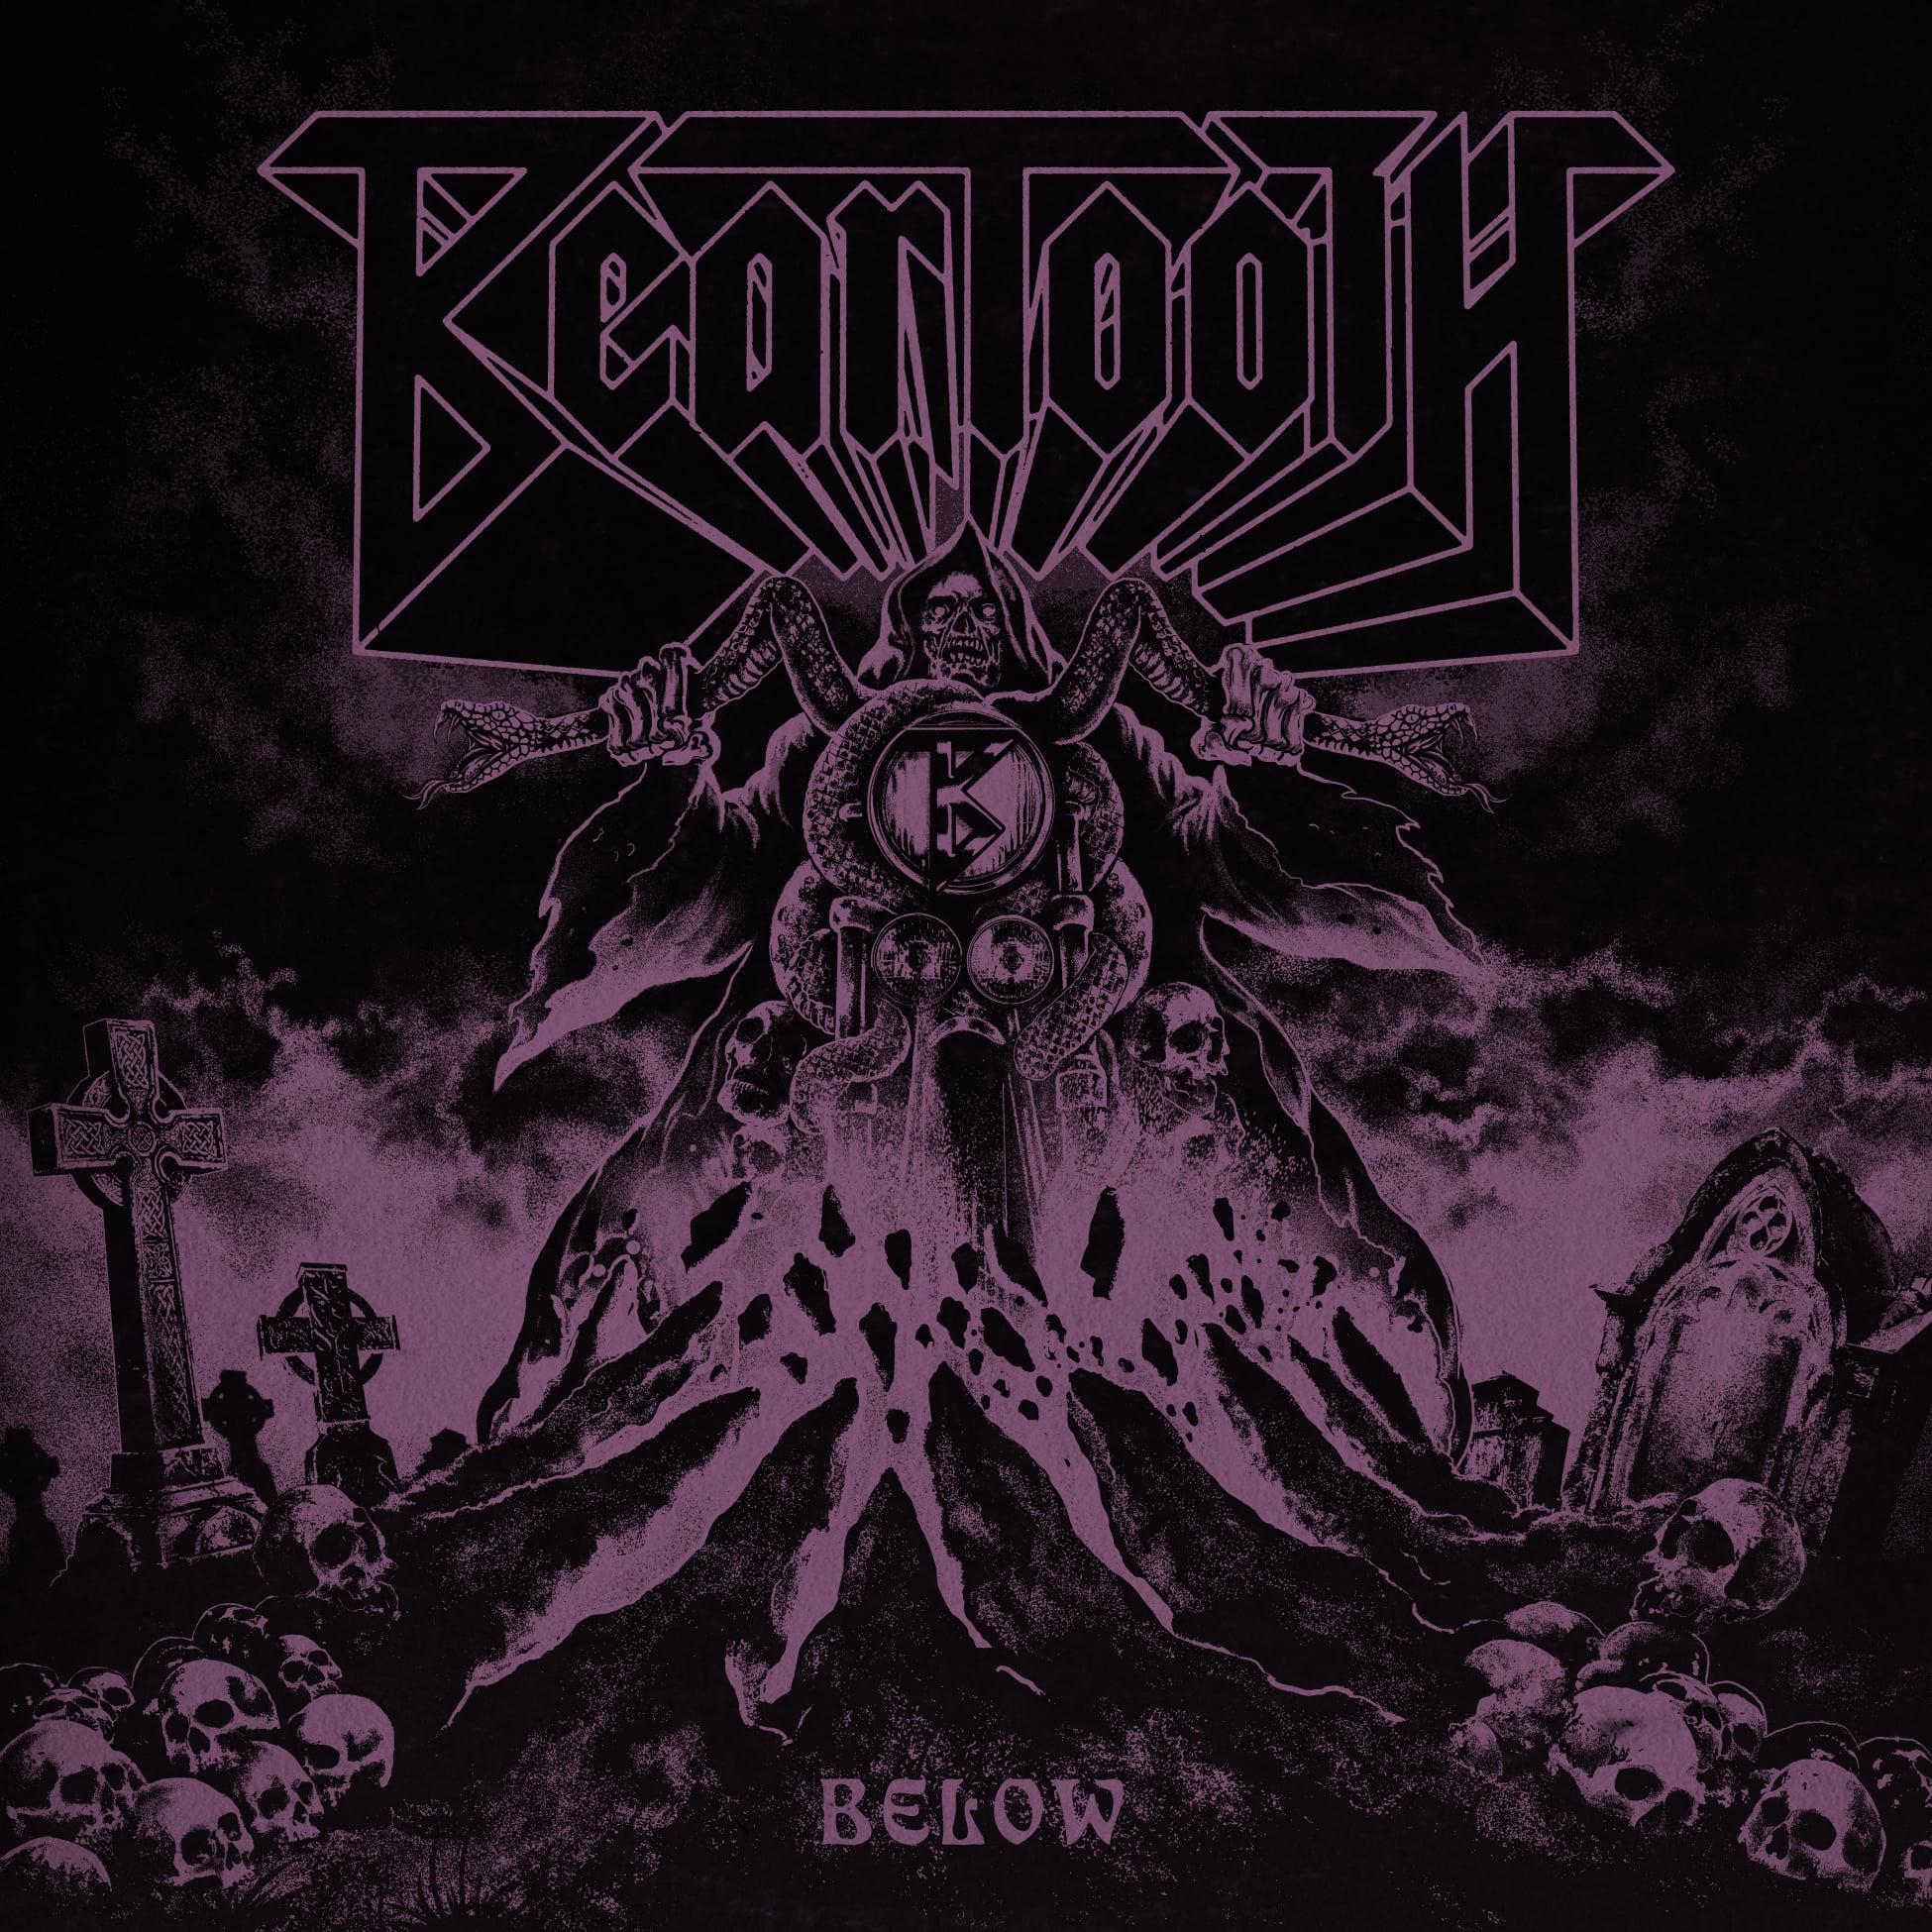 Beartooth Below Album Cover Artwork